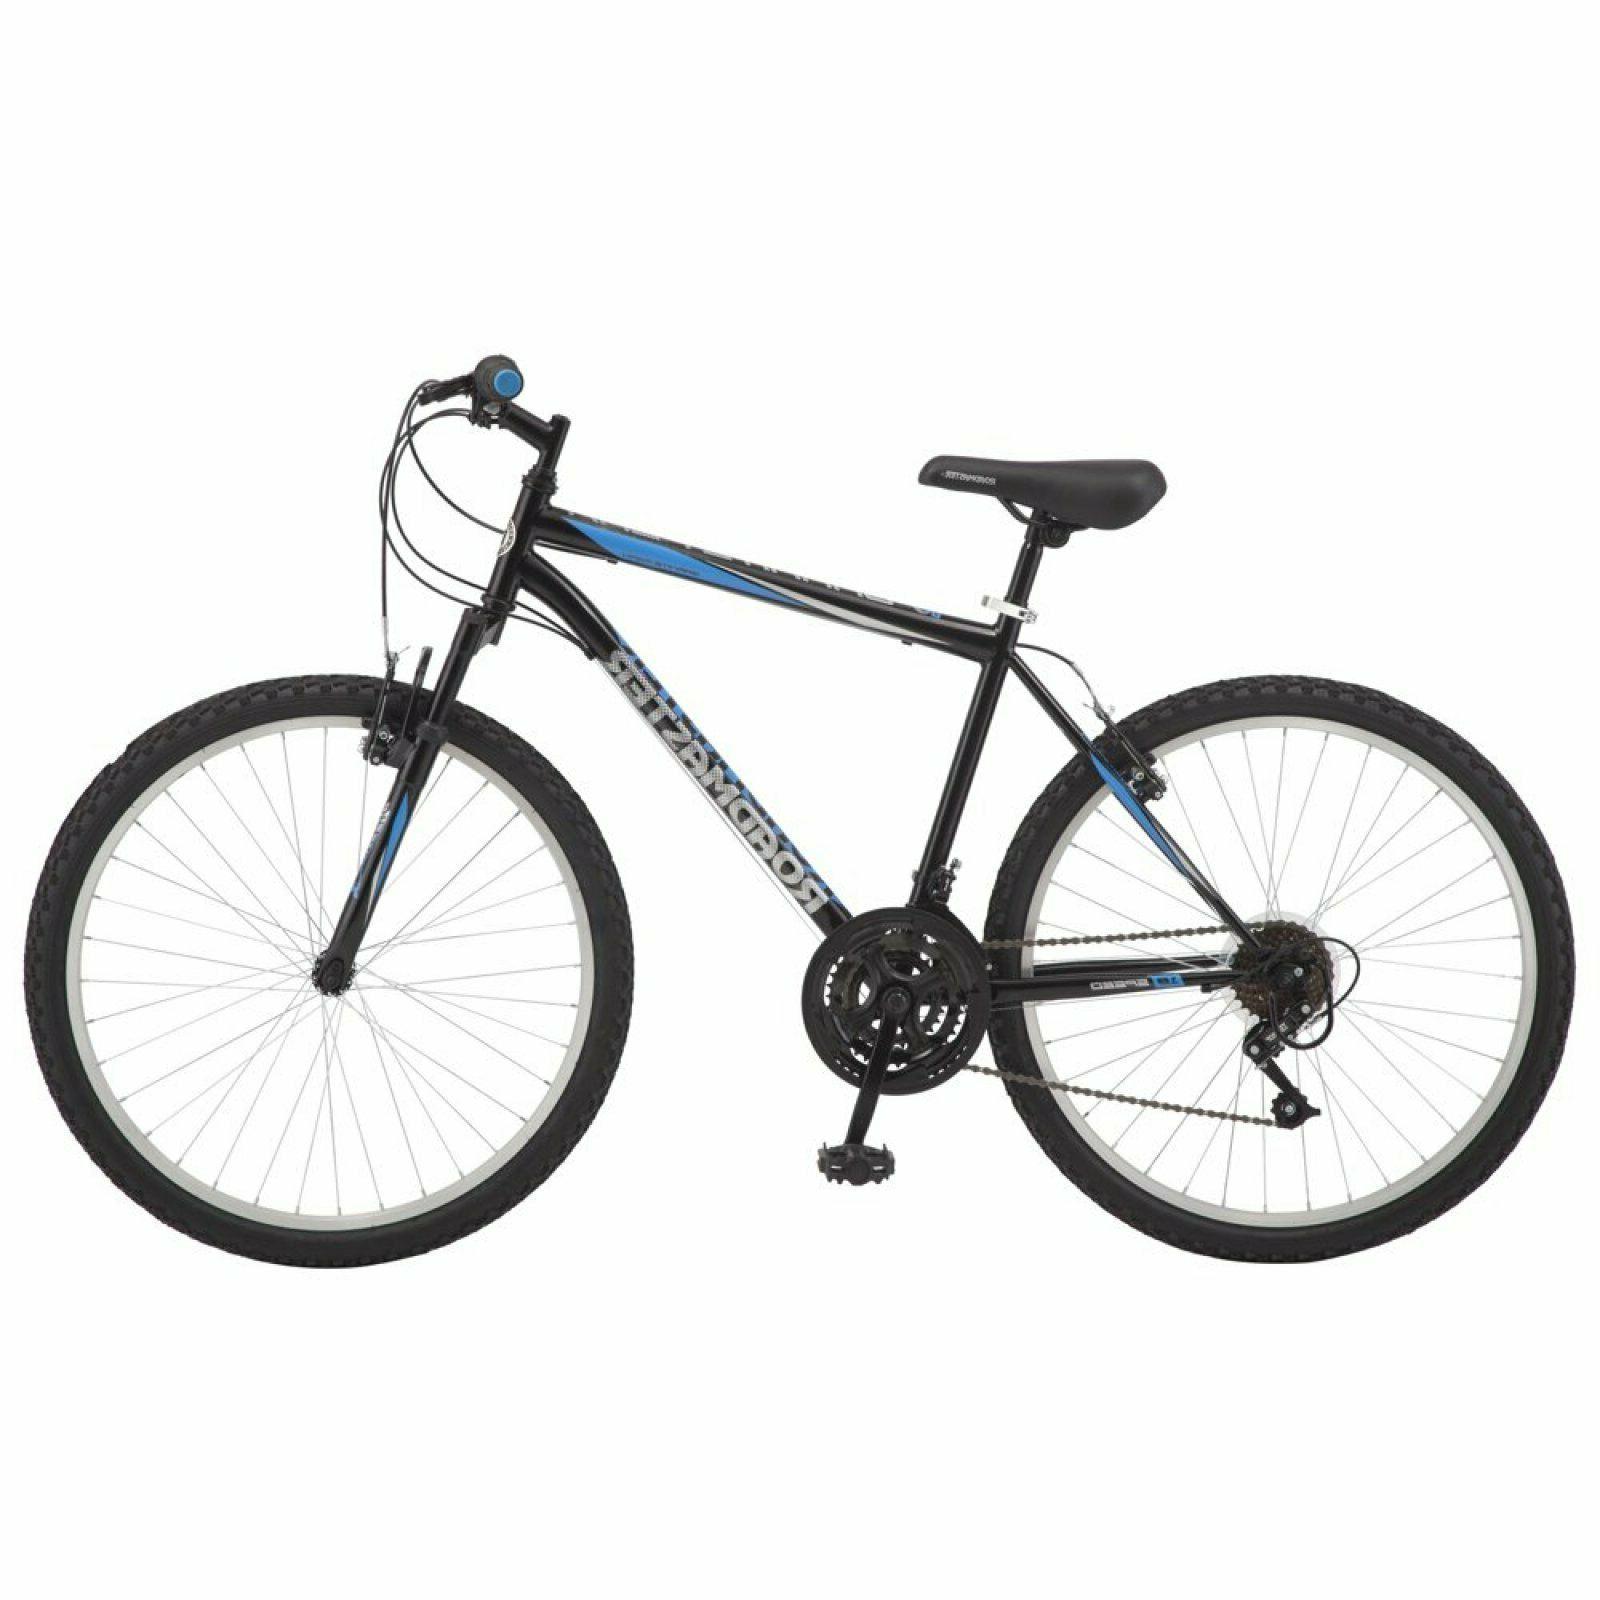 Men's Bike 26 Inch Frame 18 Speeds New